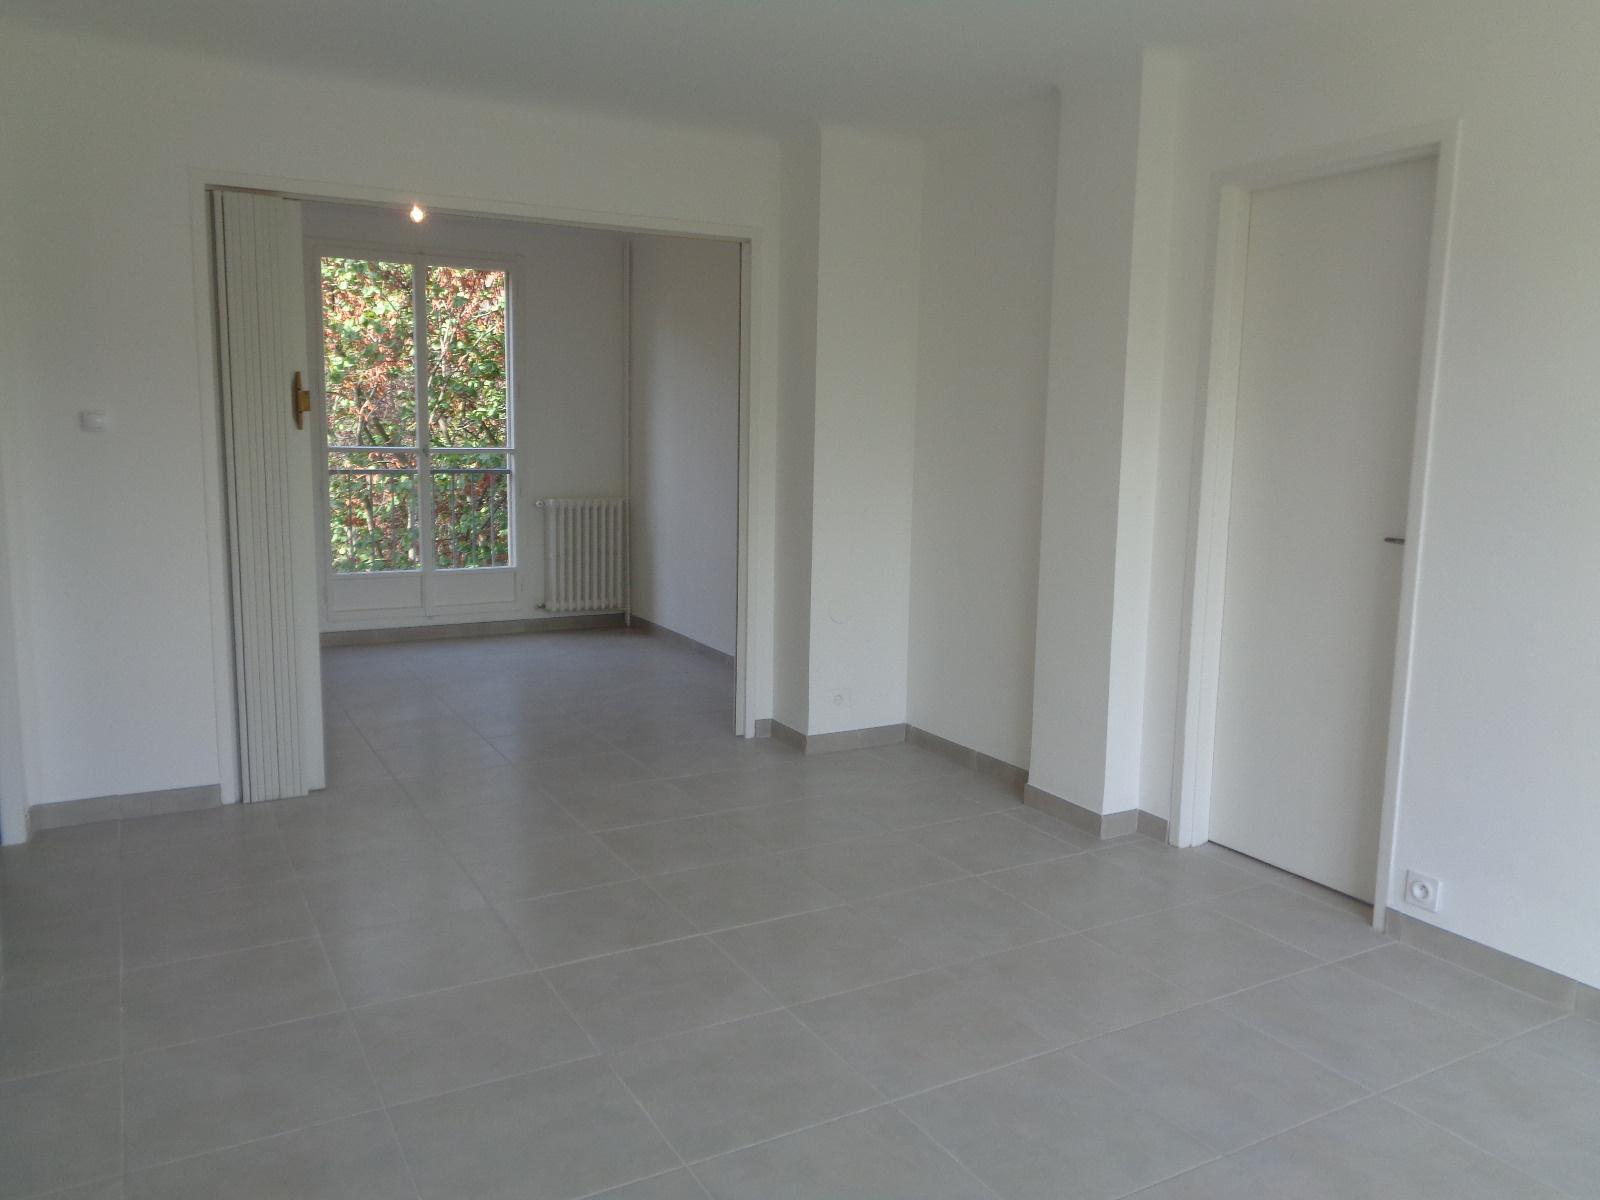 location appartement aix en provence location studio t2 t3 et plus aix en provence. Black Bedroom Furniture Sets. Home Design Ideas